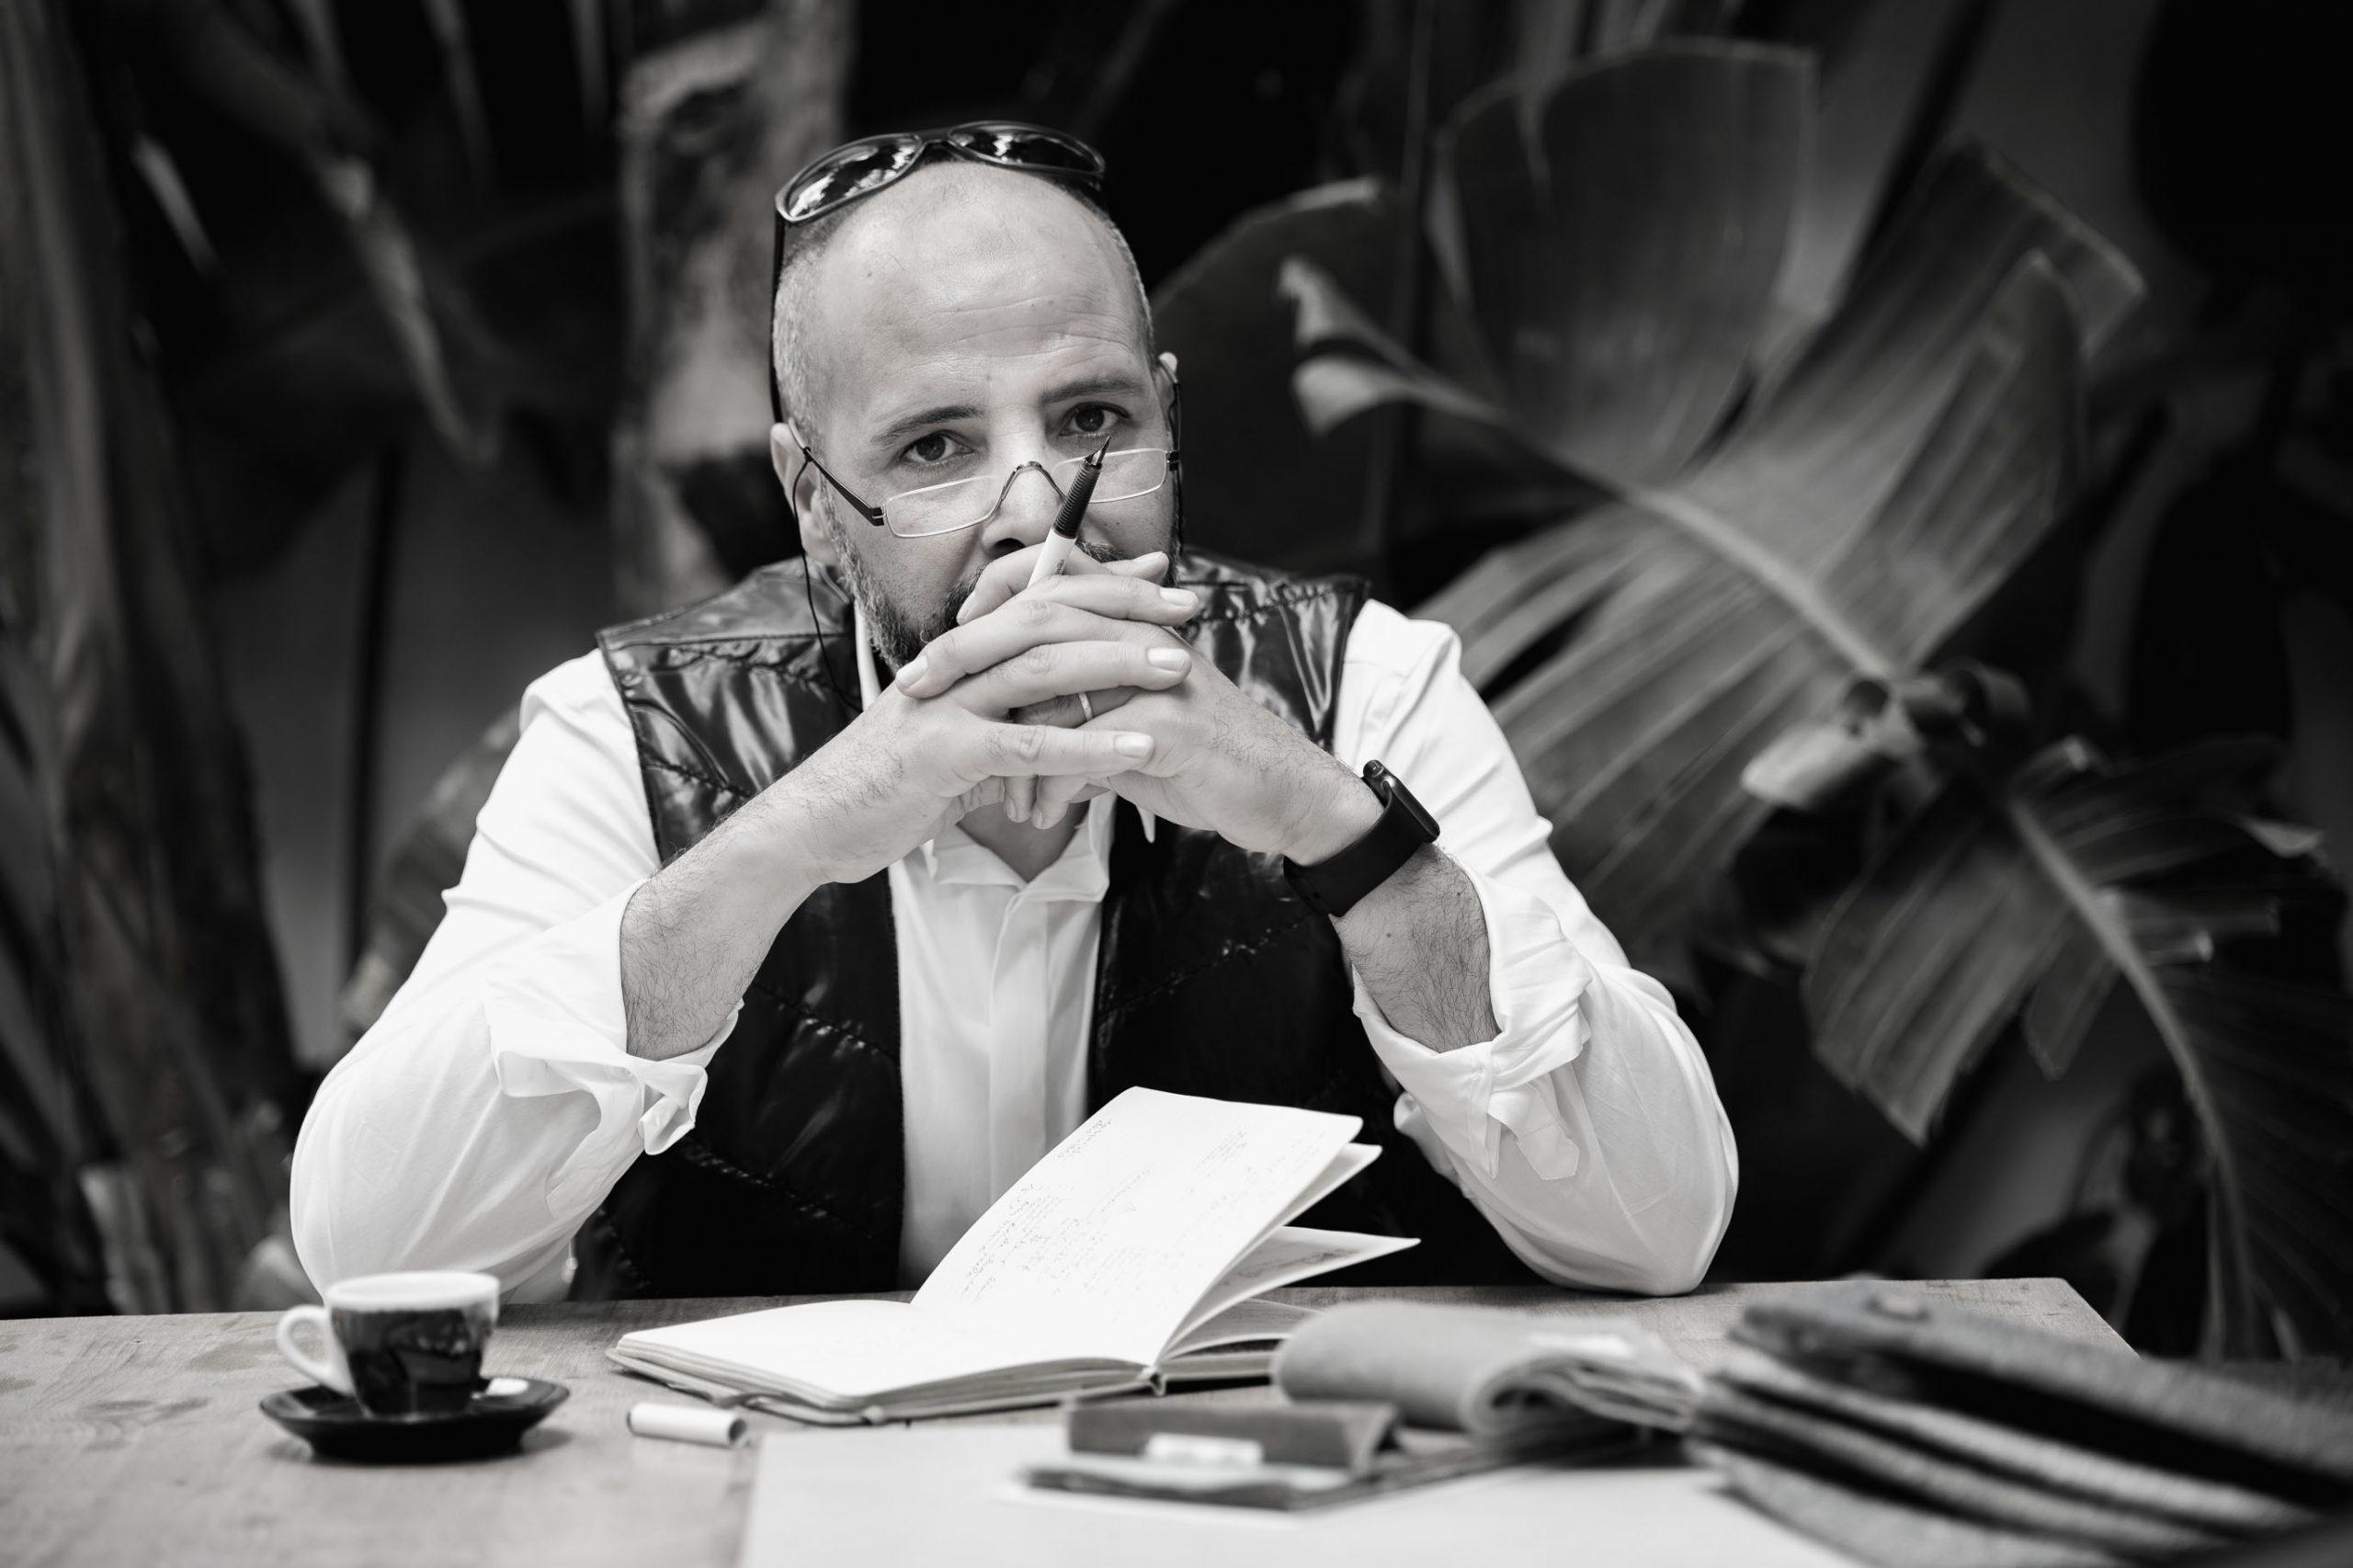 Youssef Derouich